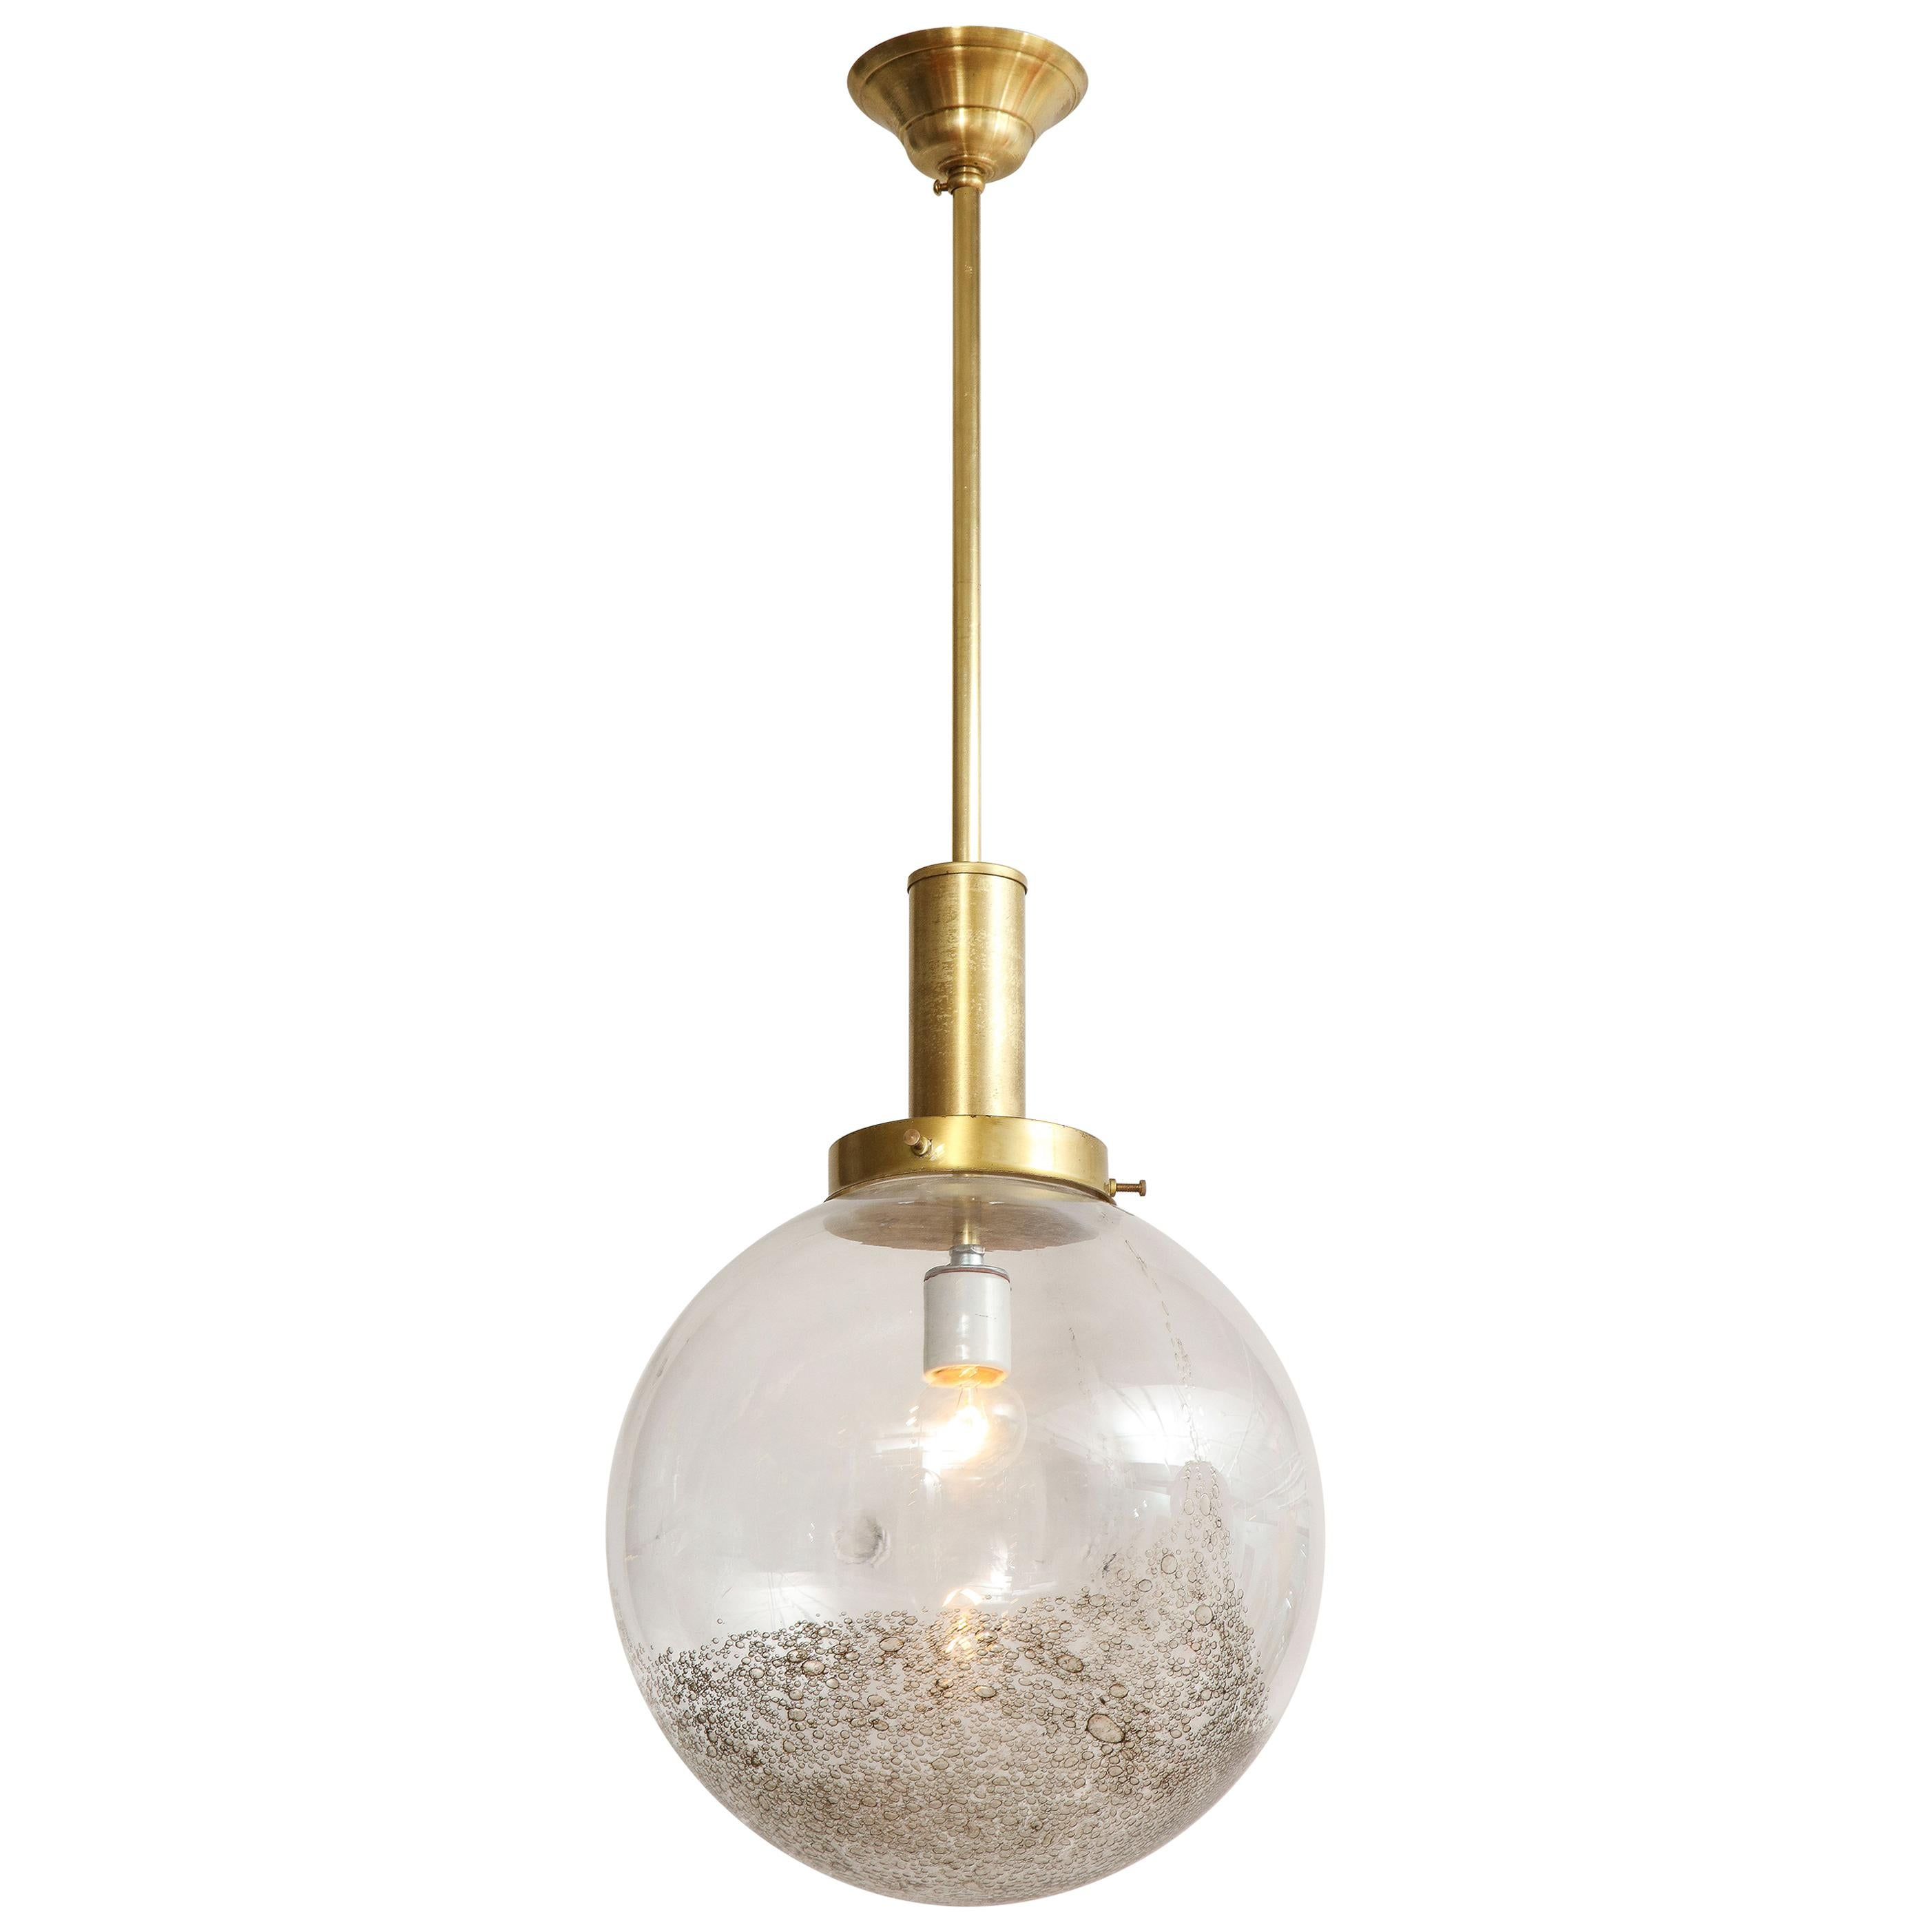 Italian Murano 1960s Glass Globe Chandelier